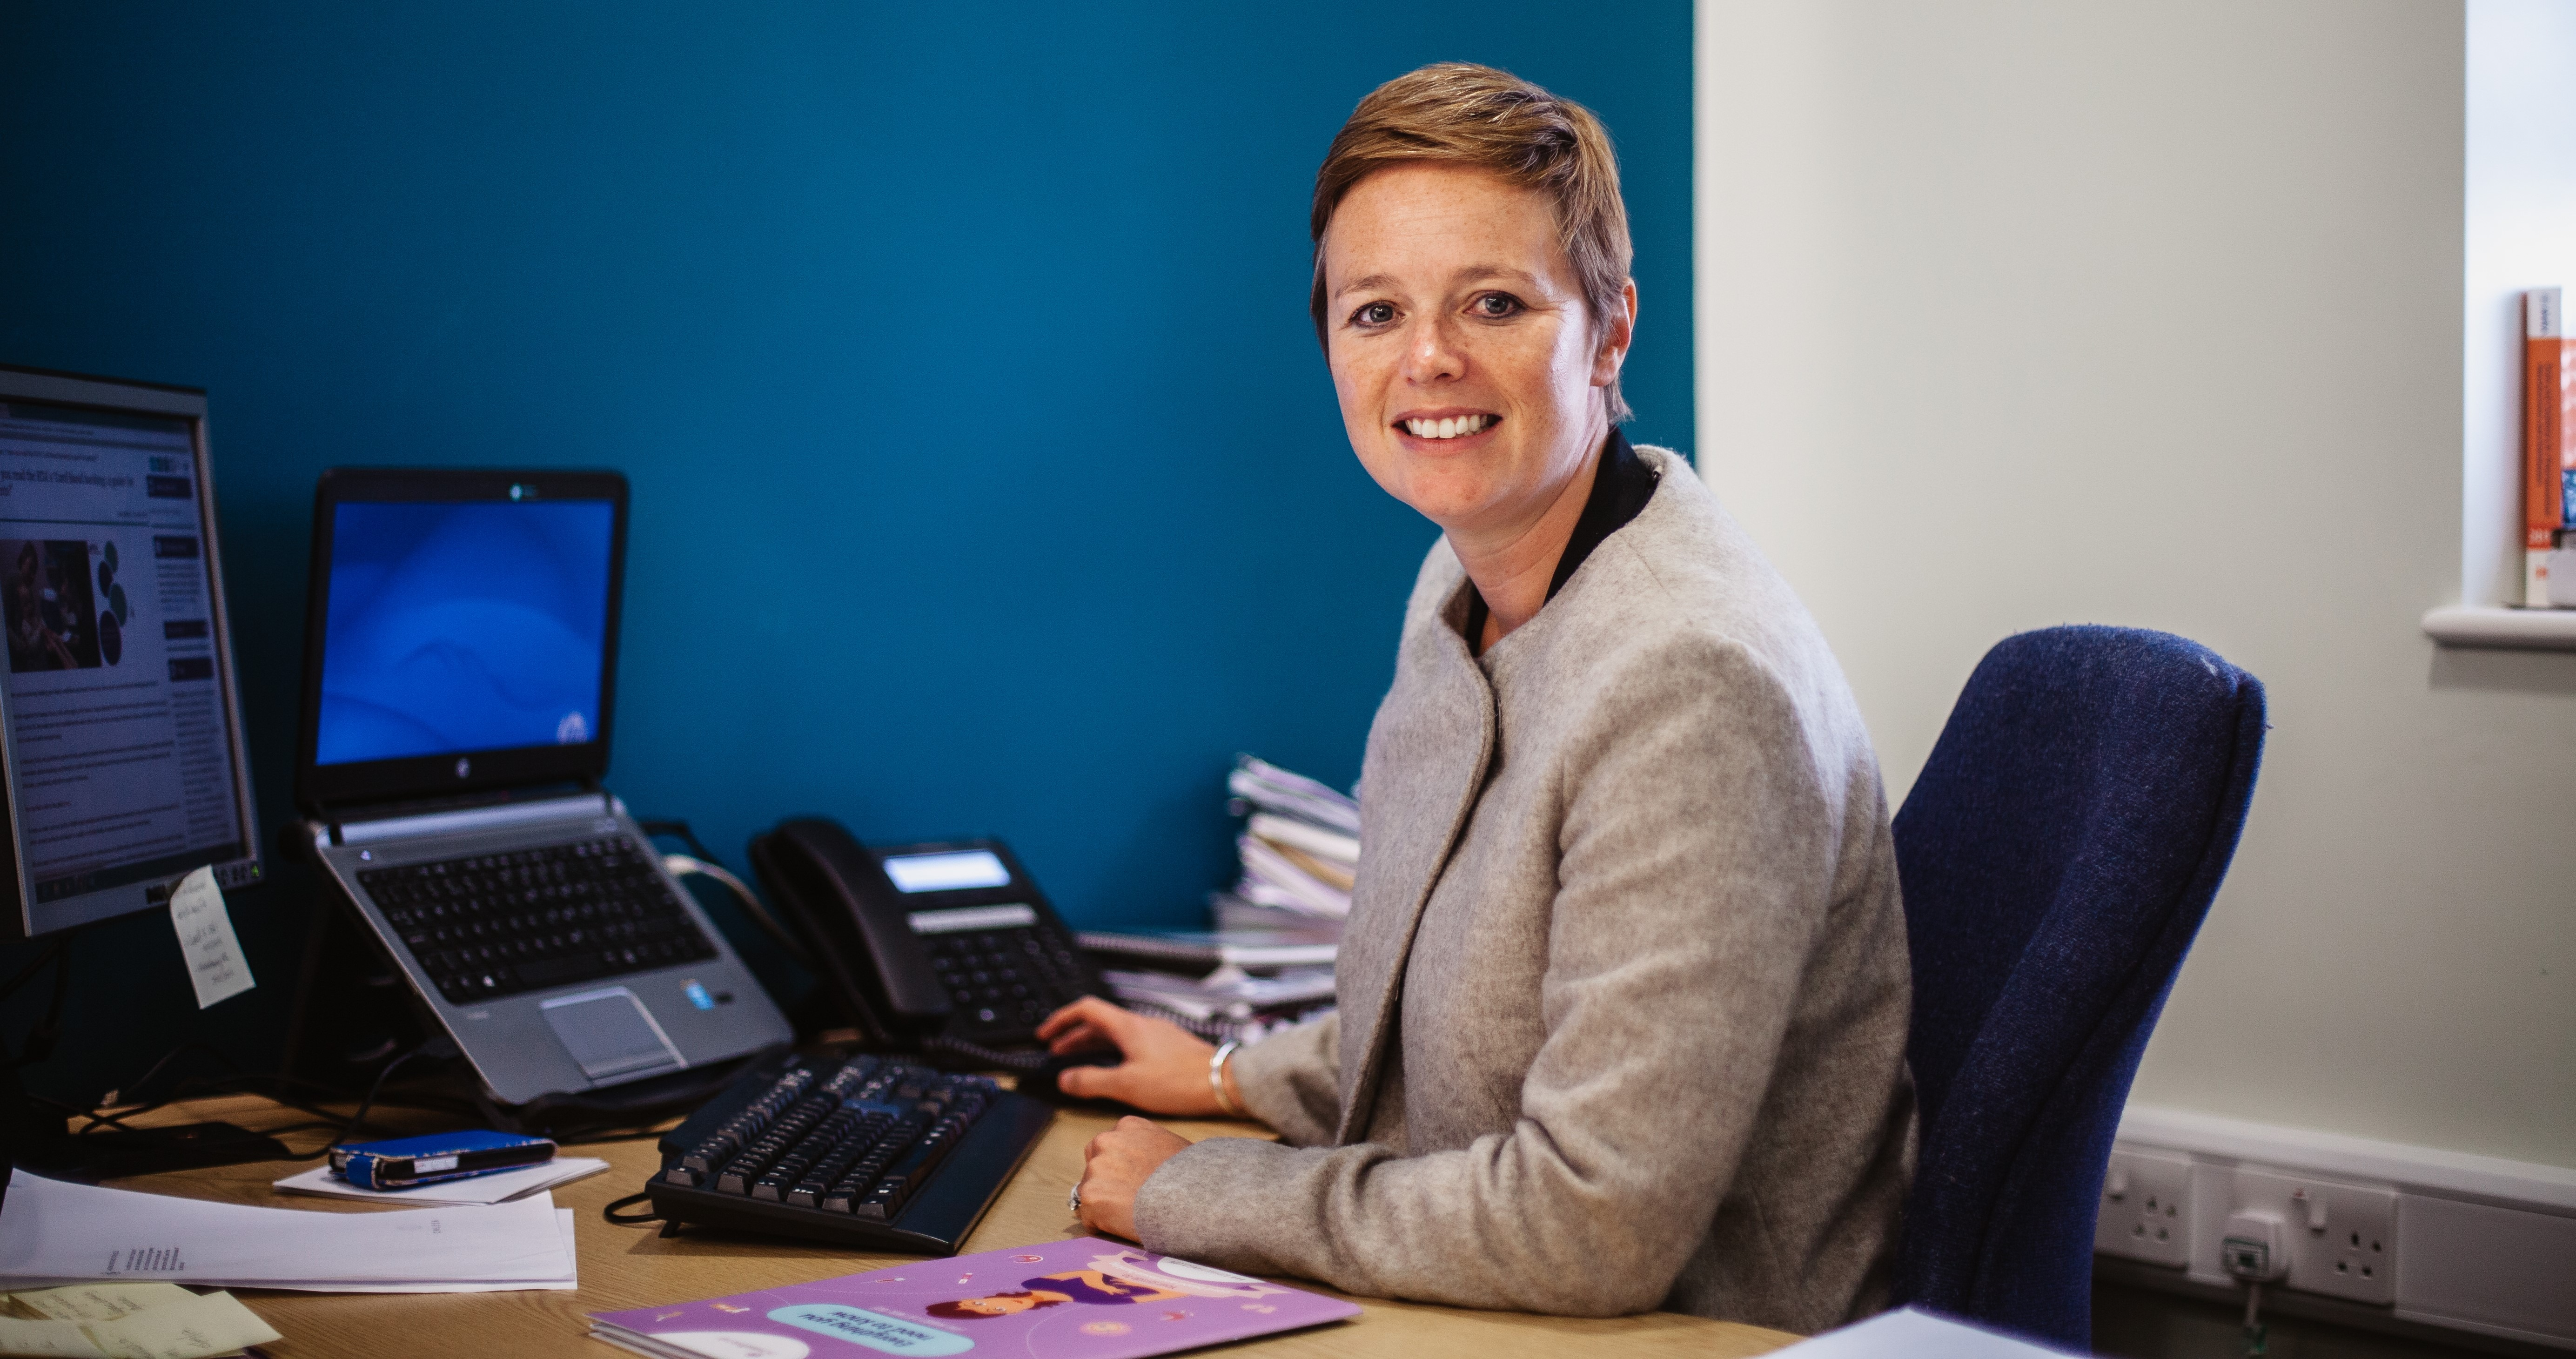 Biovault Family's CEO Kate Sneddon